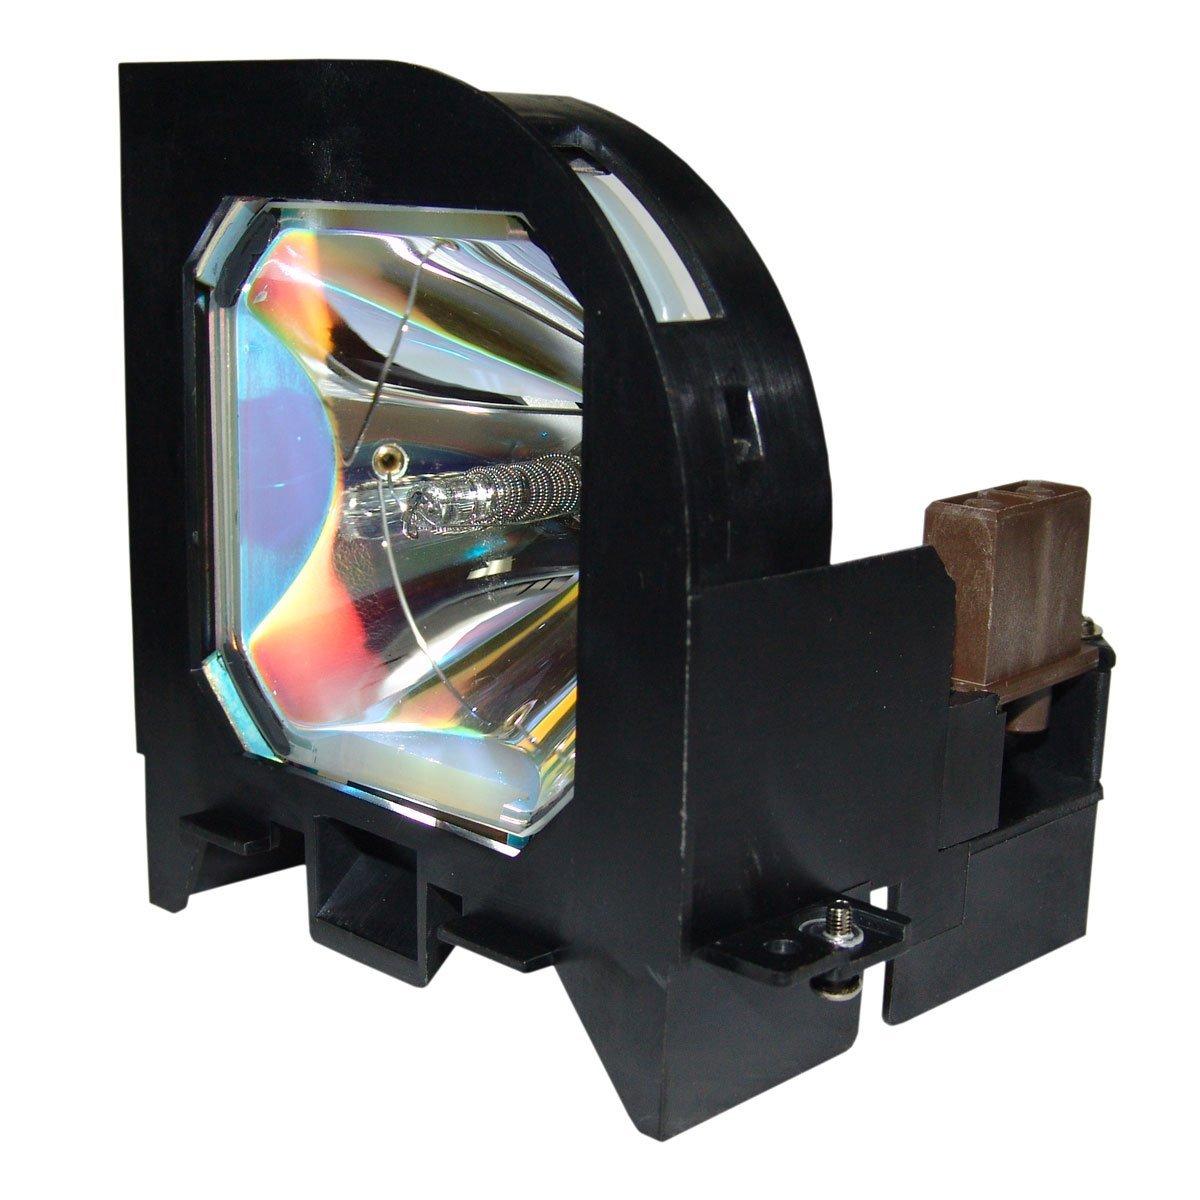 Projector Lamp Bulb LMP-F250 LMPF250 for SONY VPL-FX50 VPL-FE110 with housing original replacement projector lamp bulb lmp f272 for sony vpl fx35 vpl fh30 vpl fh35 vpl fh31 projector nsha275w